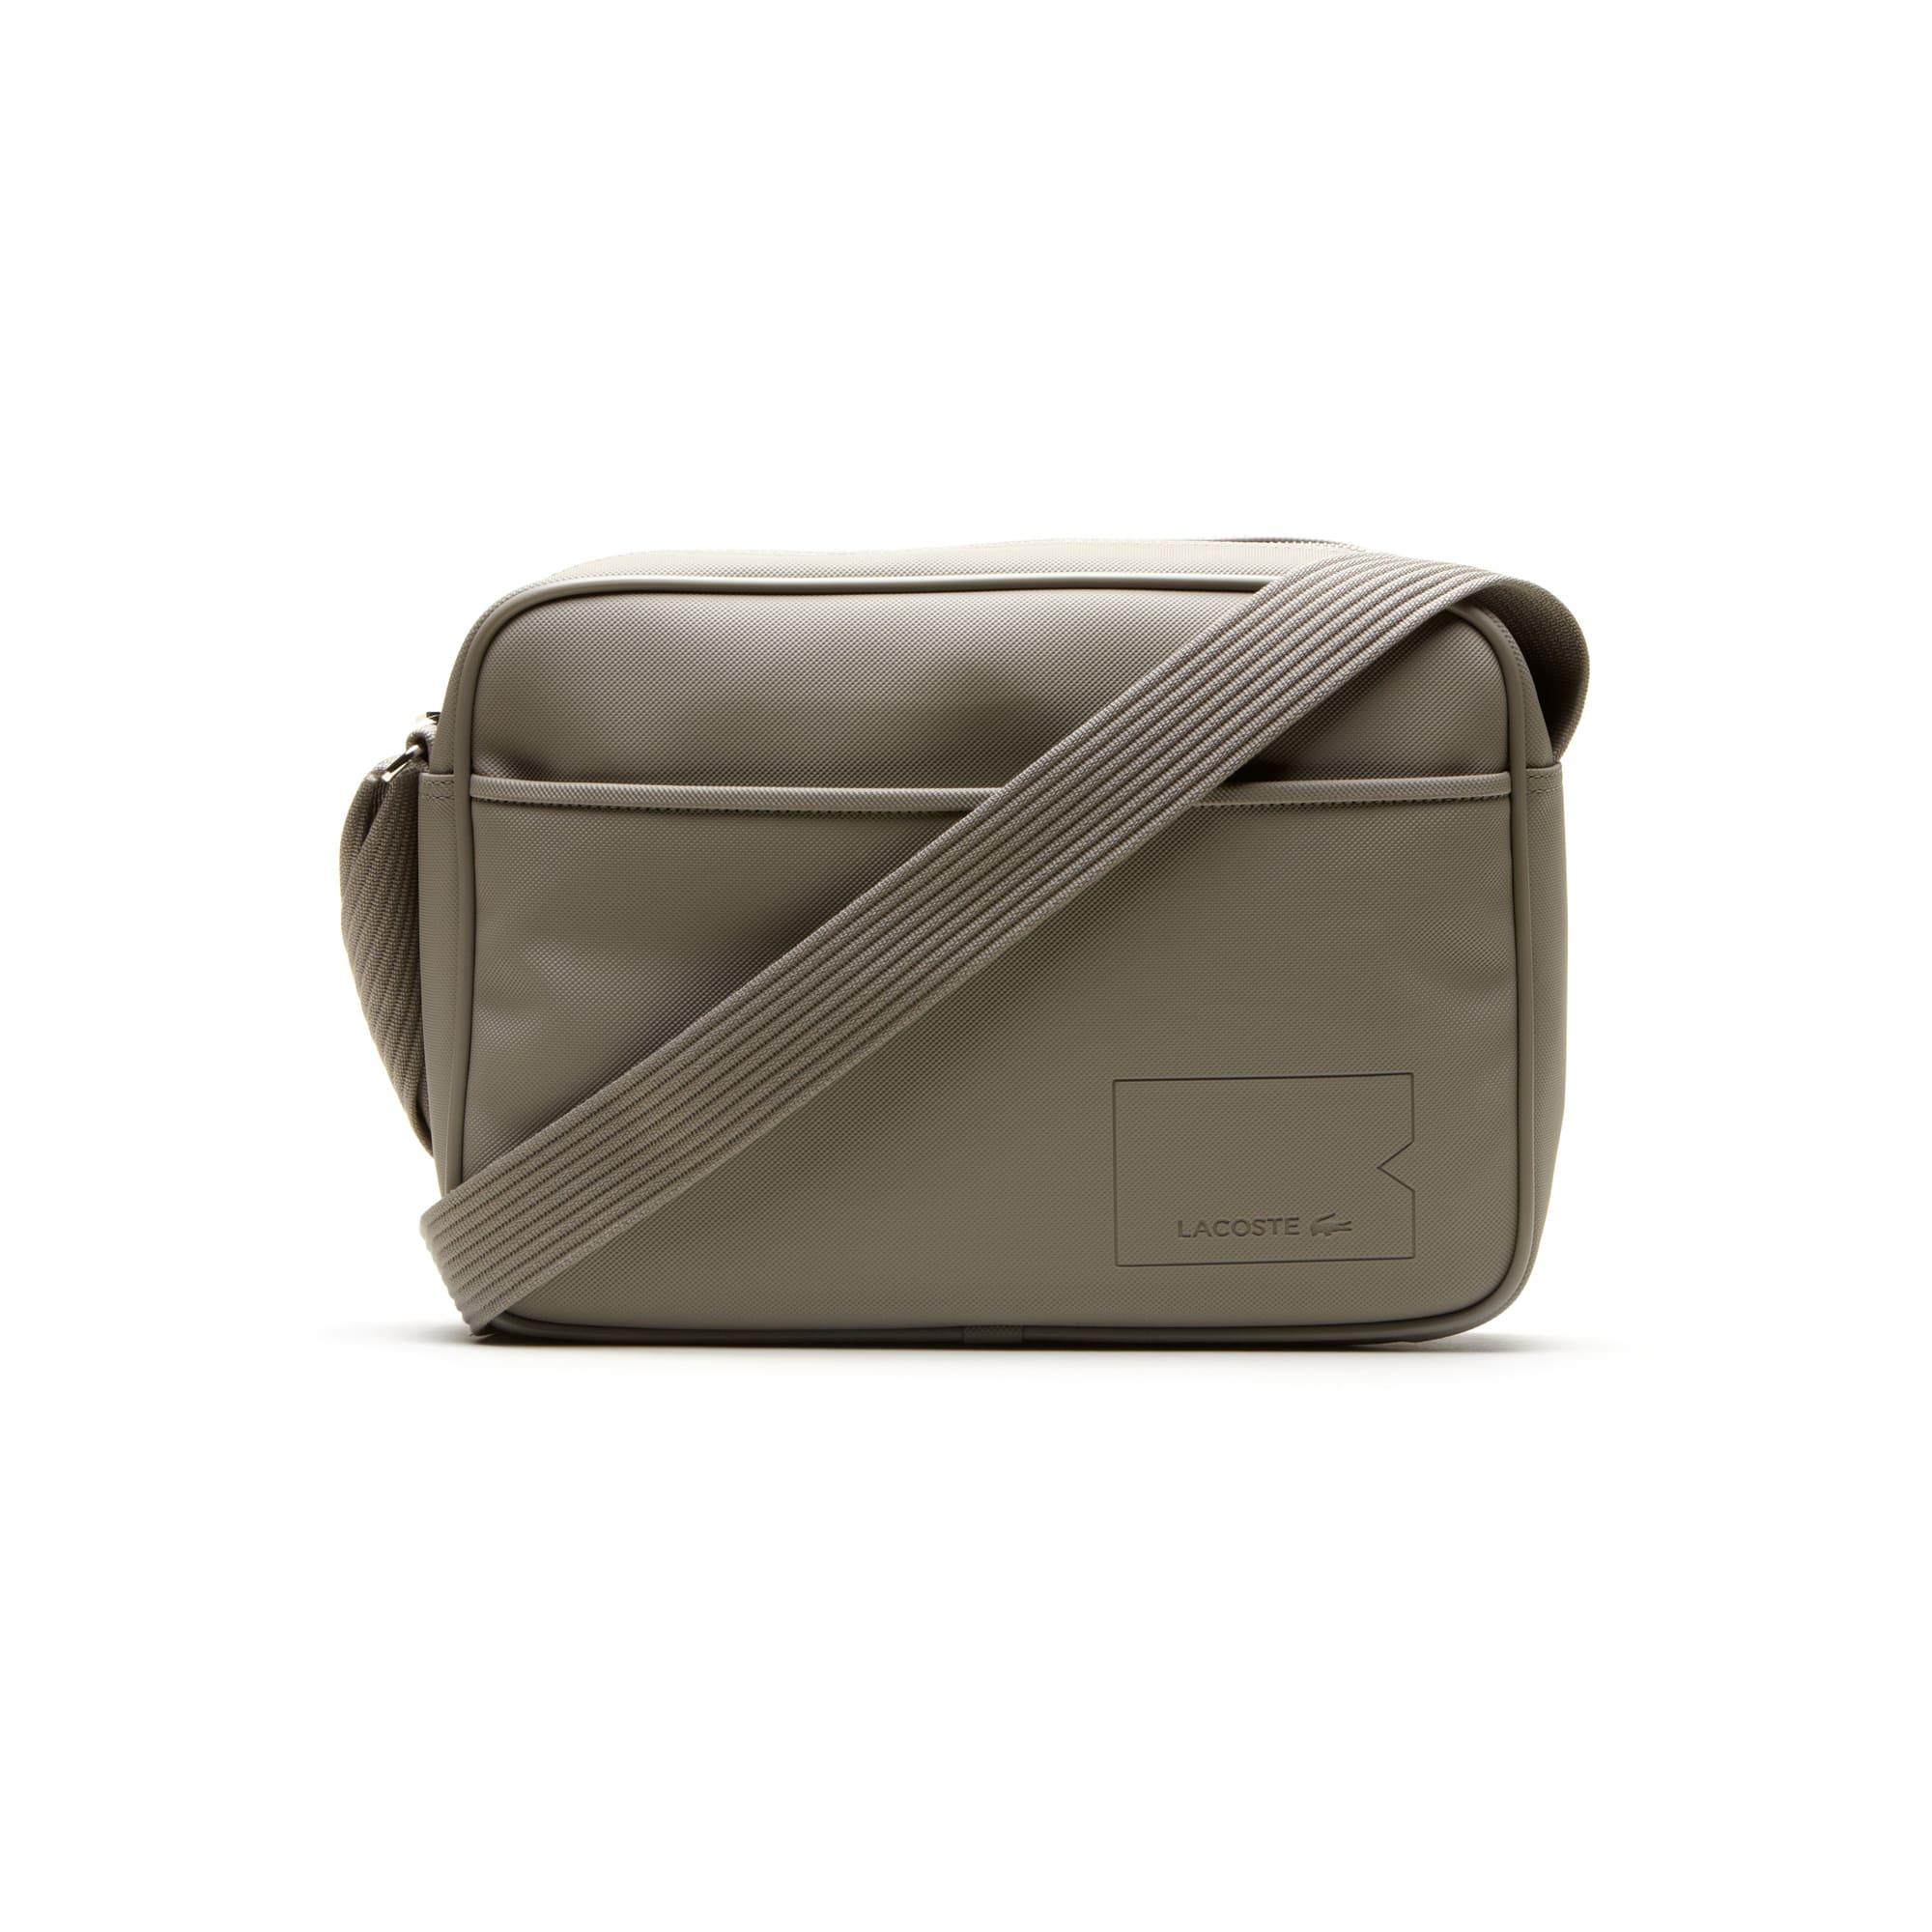 Men's classic monochrome airline bag